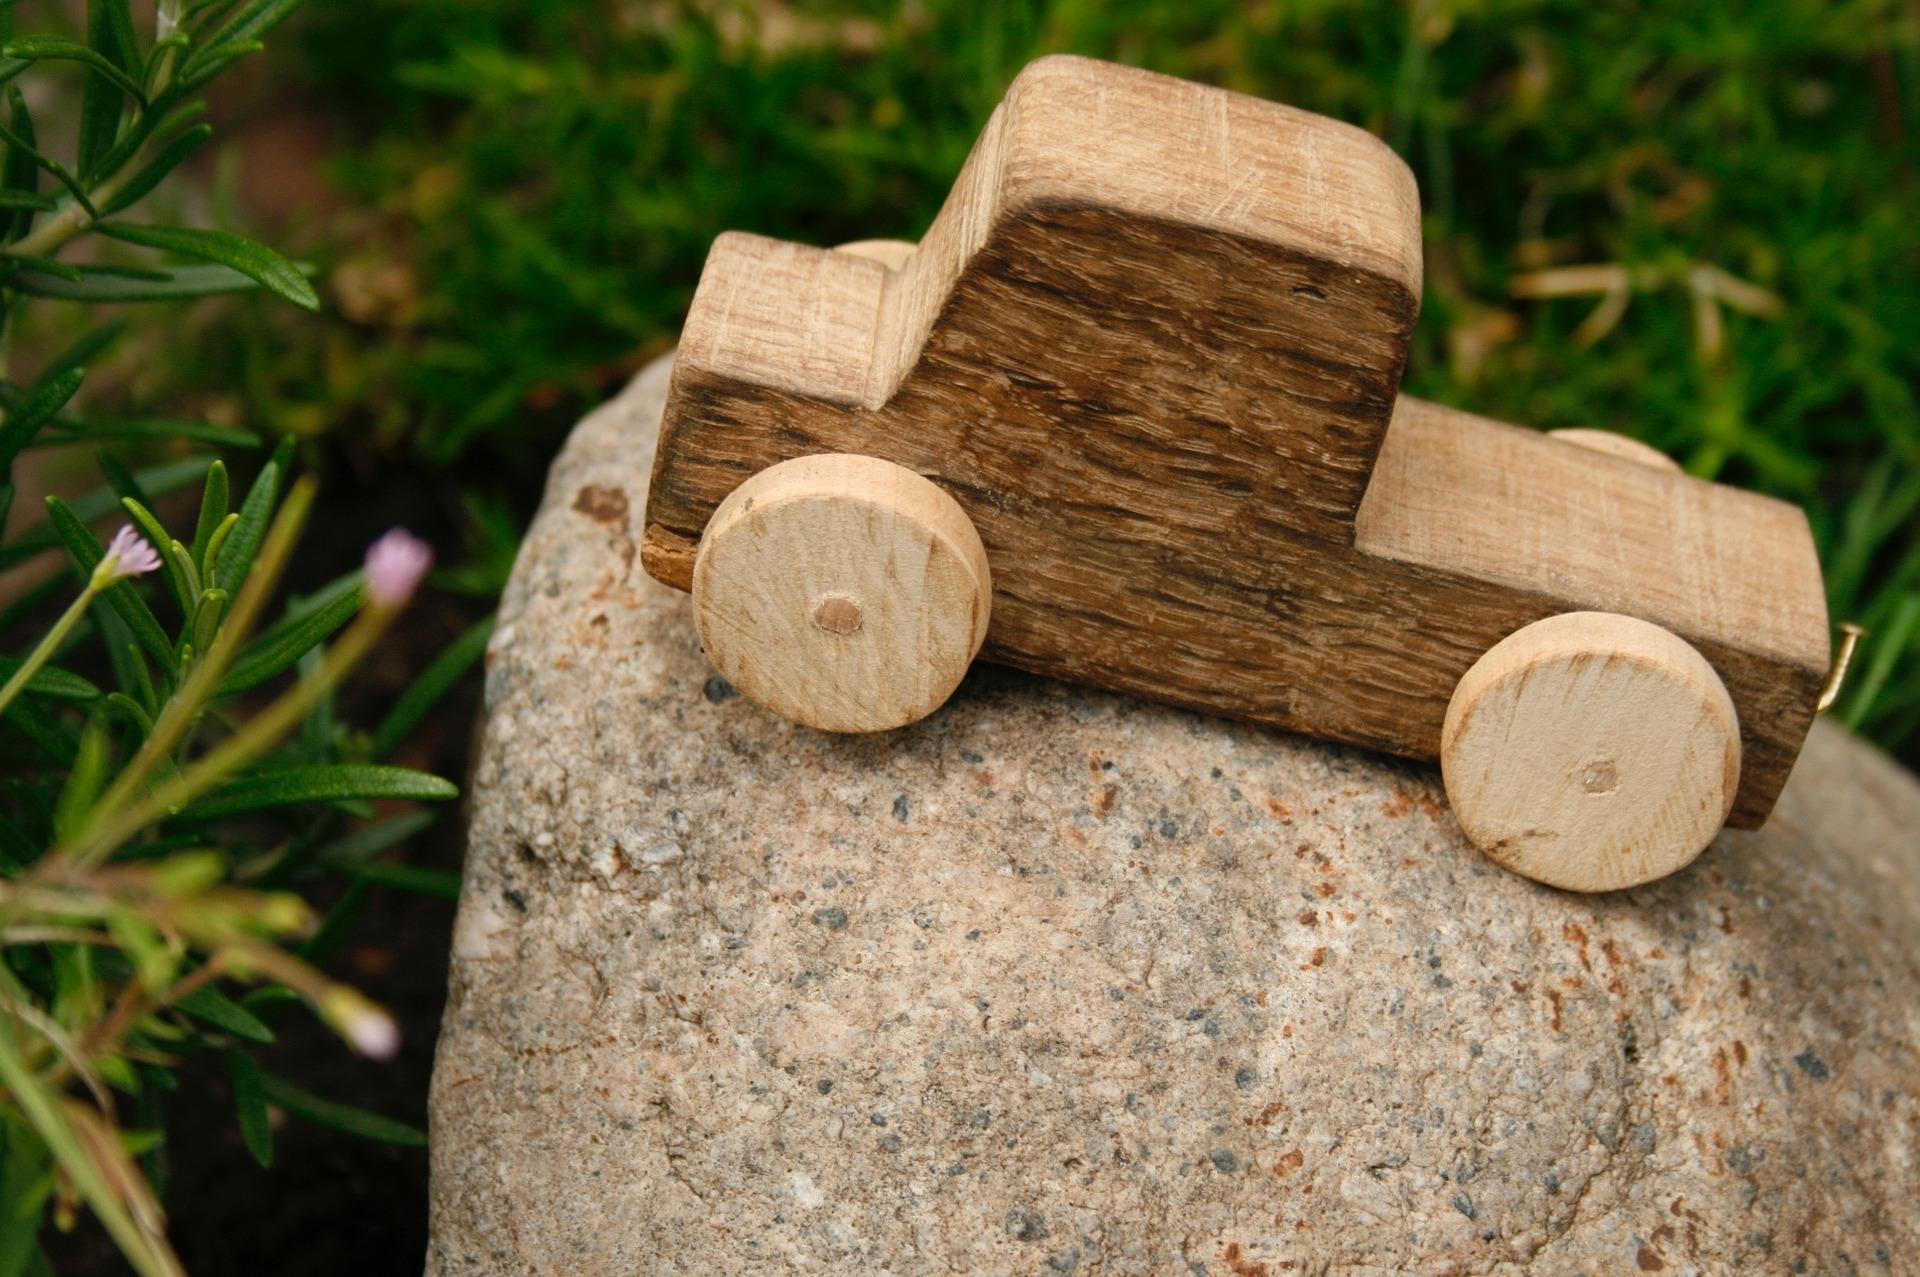 wooden-car-1039298_1920